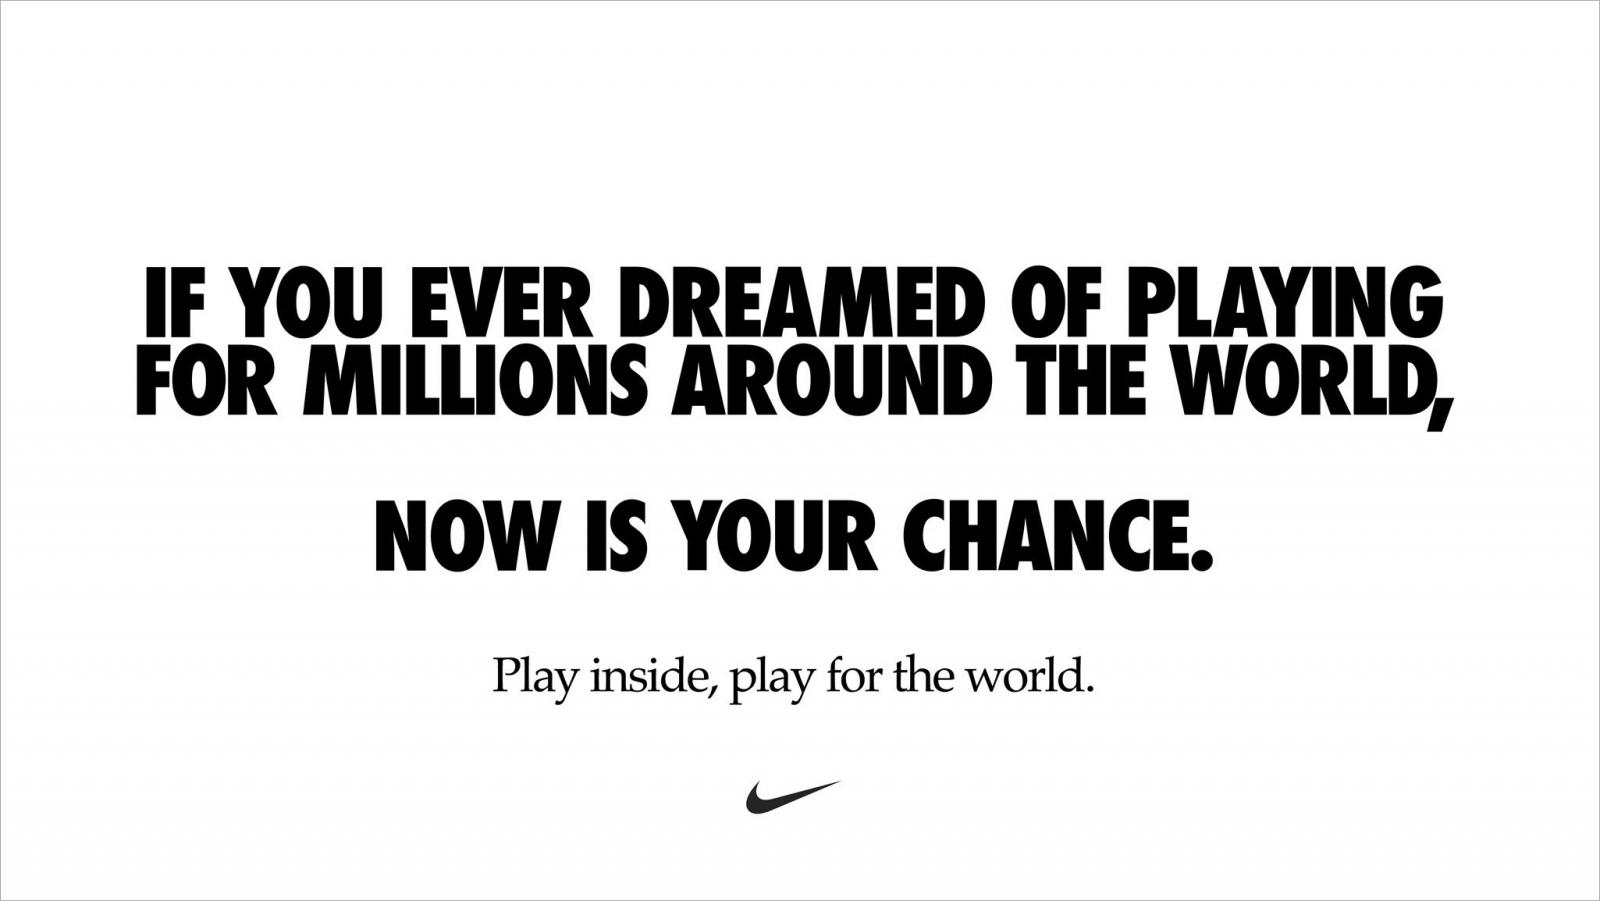 Iznenadni Silazak Posta Taljenje Nike Ad Text Creativelabor Org